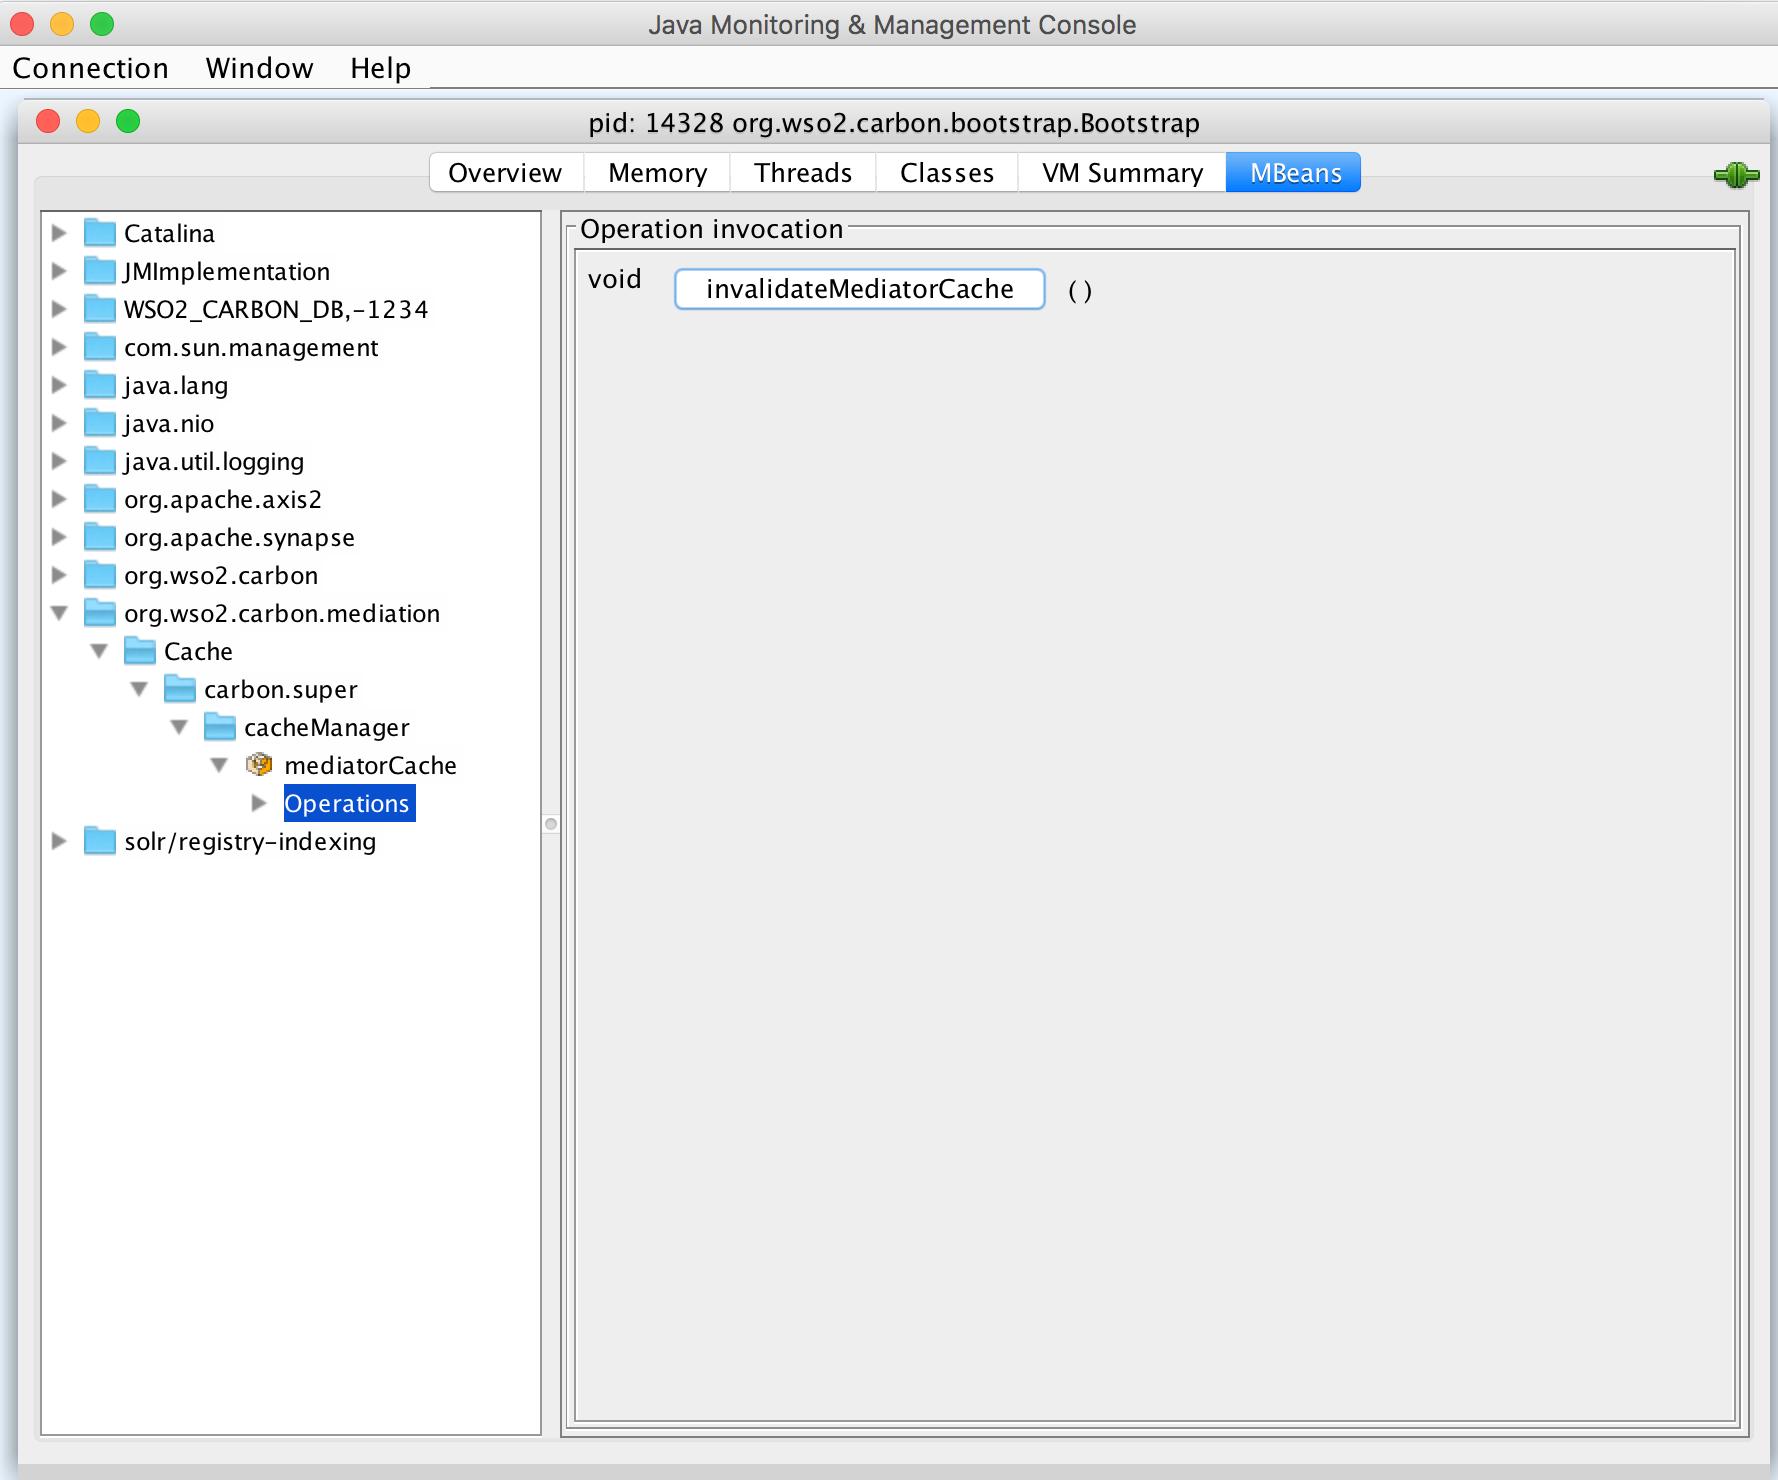 JMX monitoring through JConsole